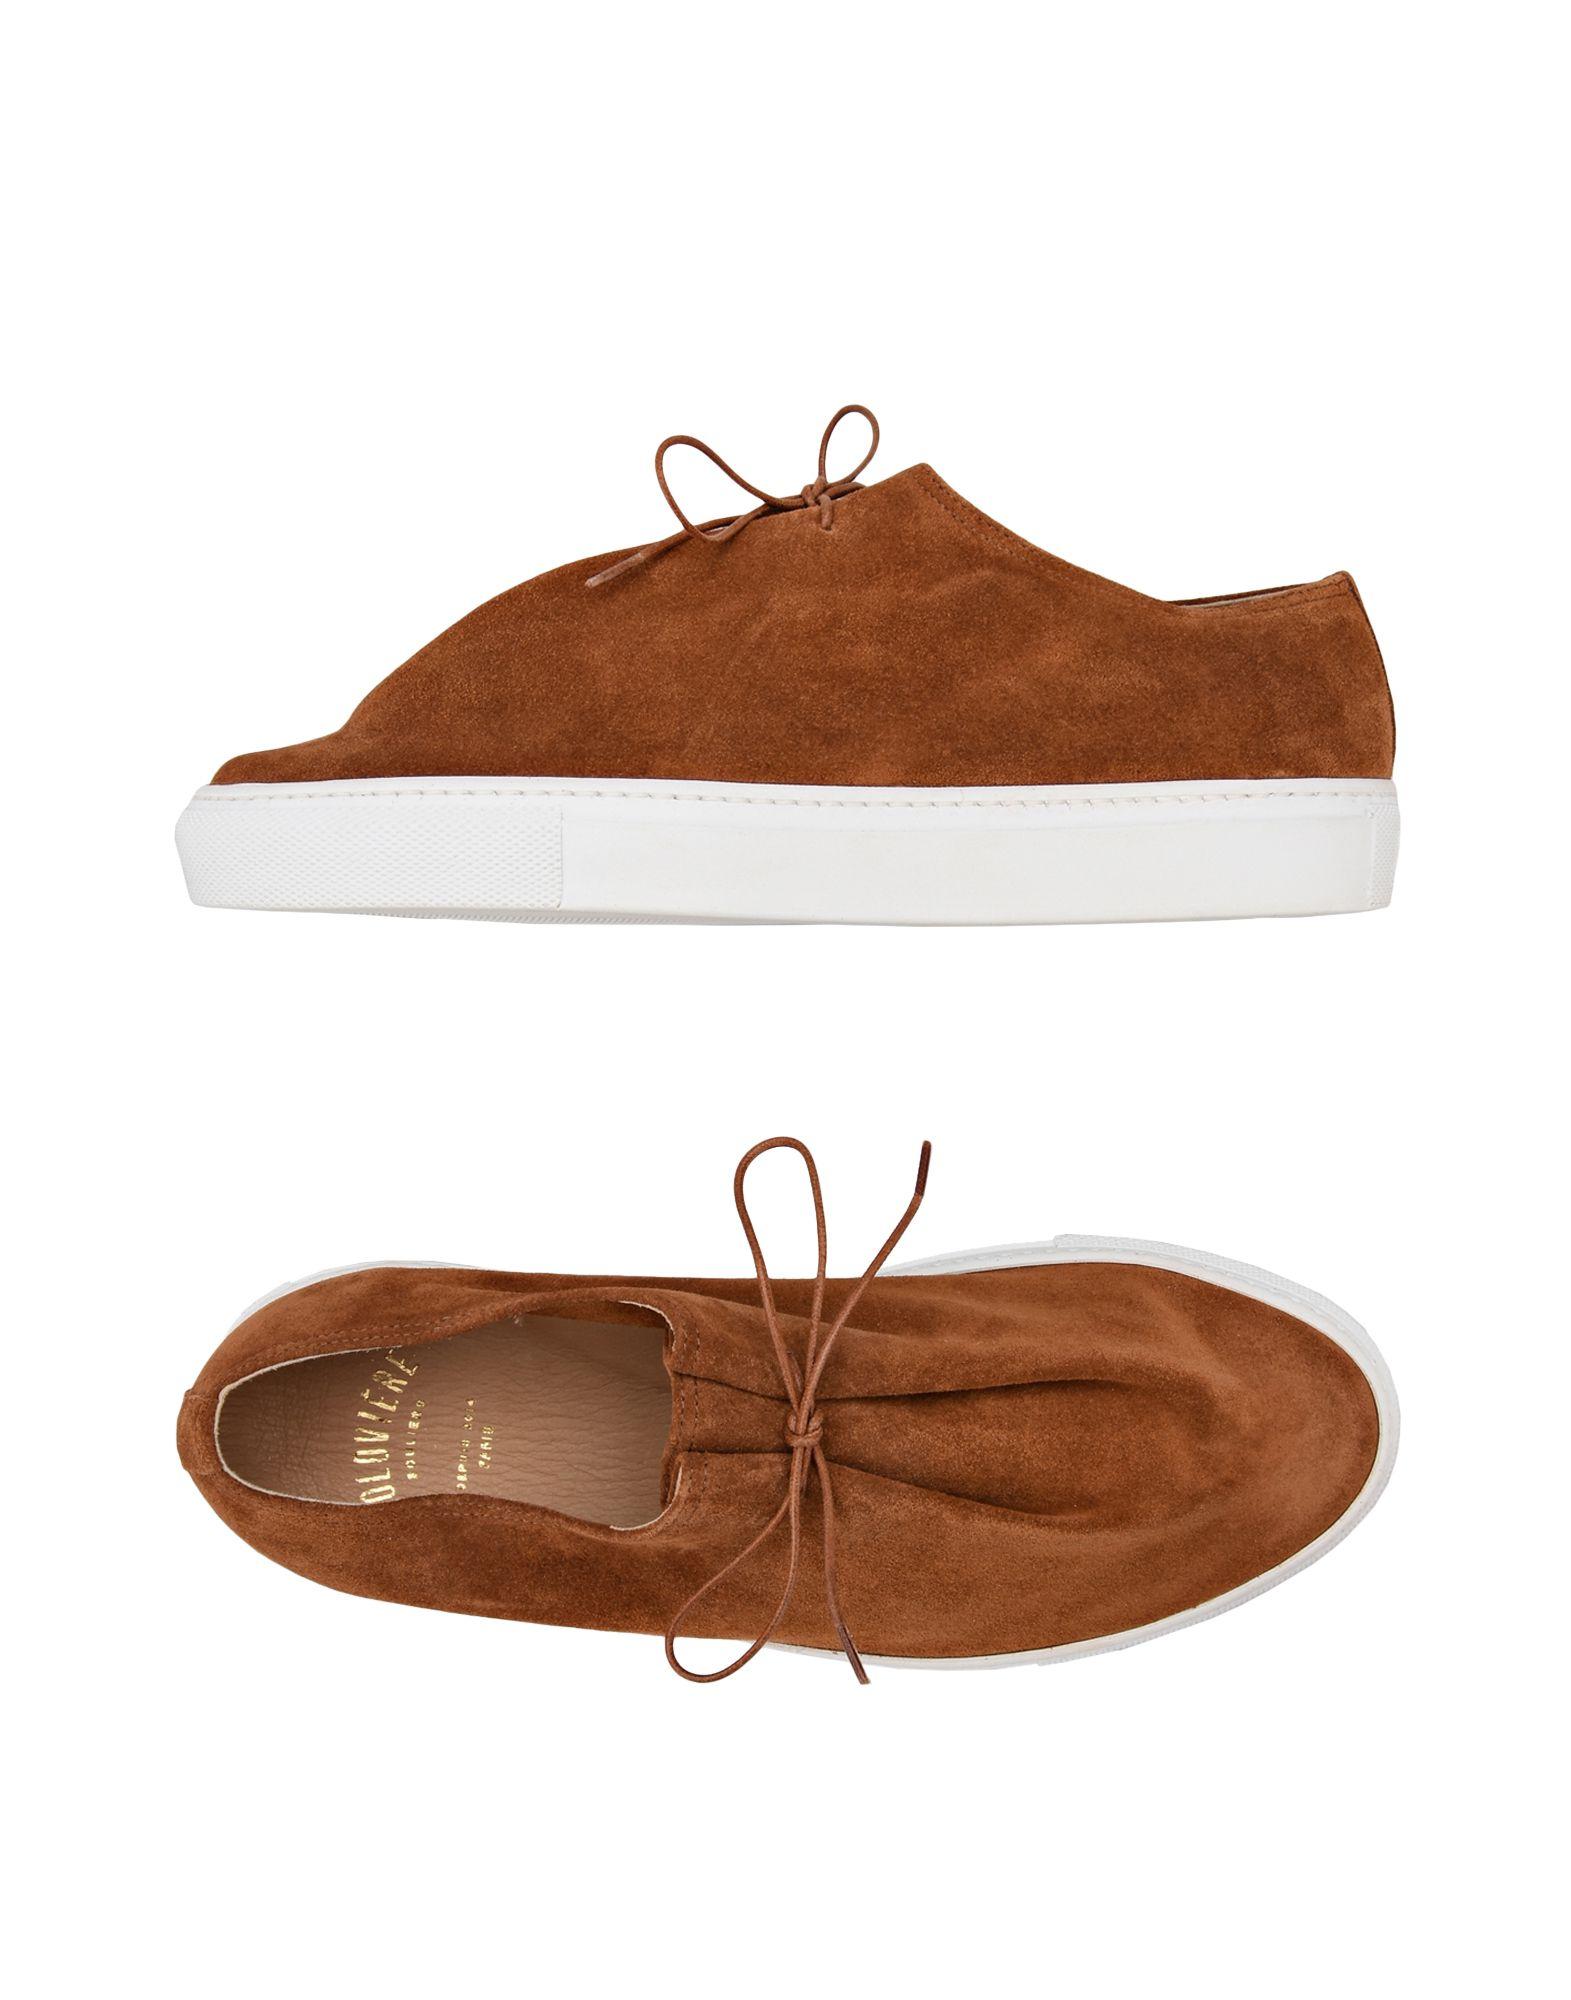 discount wide range of SOLOVIÈRE Paris Loafers sale latest collections low cost for sale for sale the cheapest official site 2suOsAzVZt